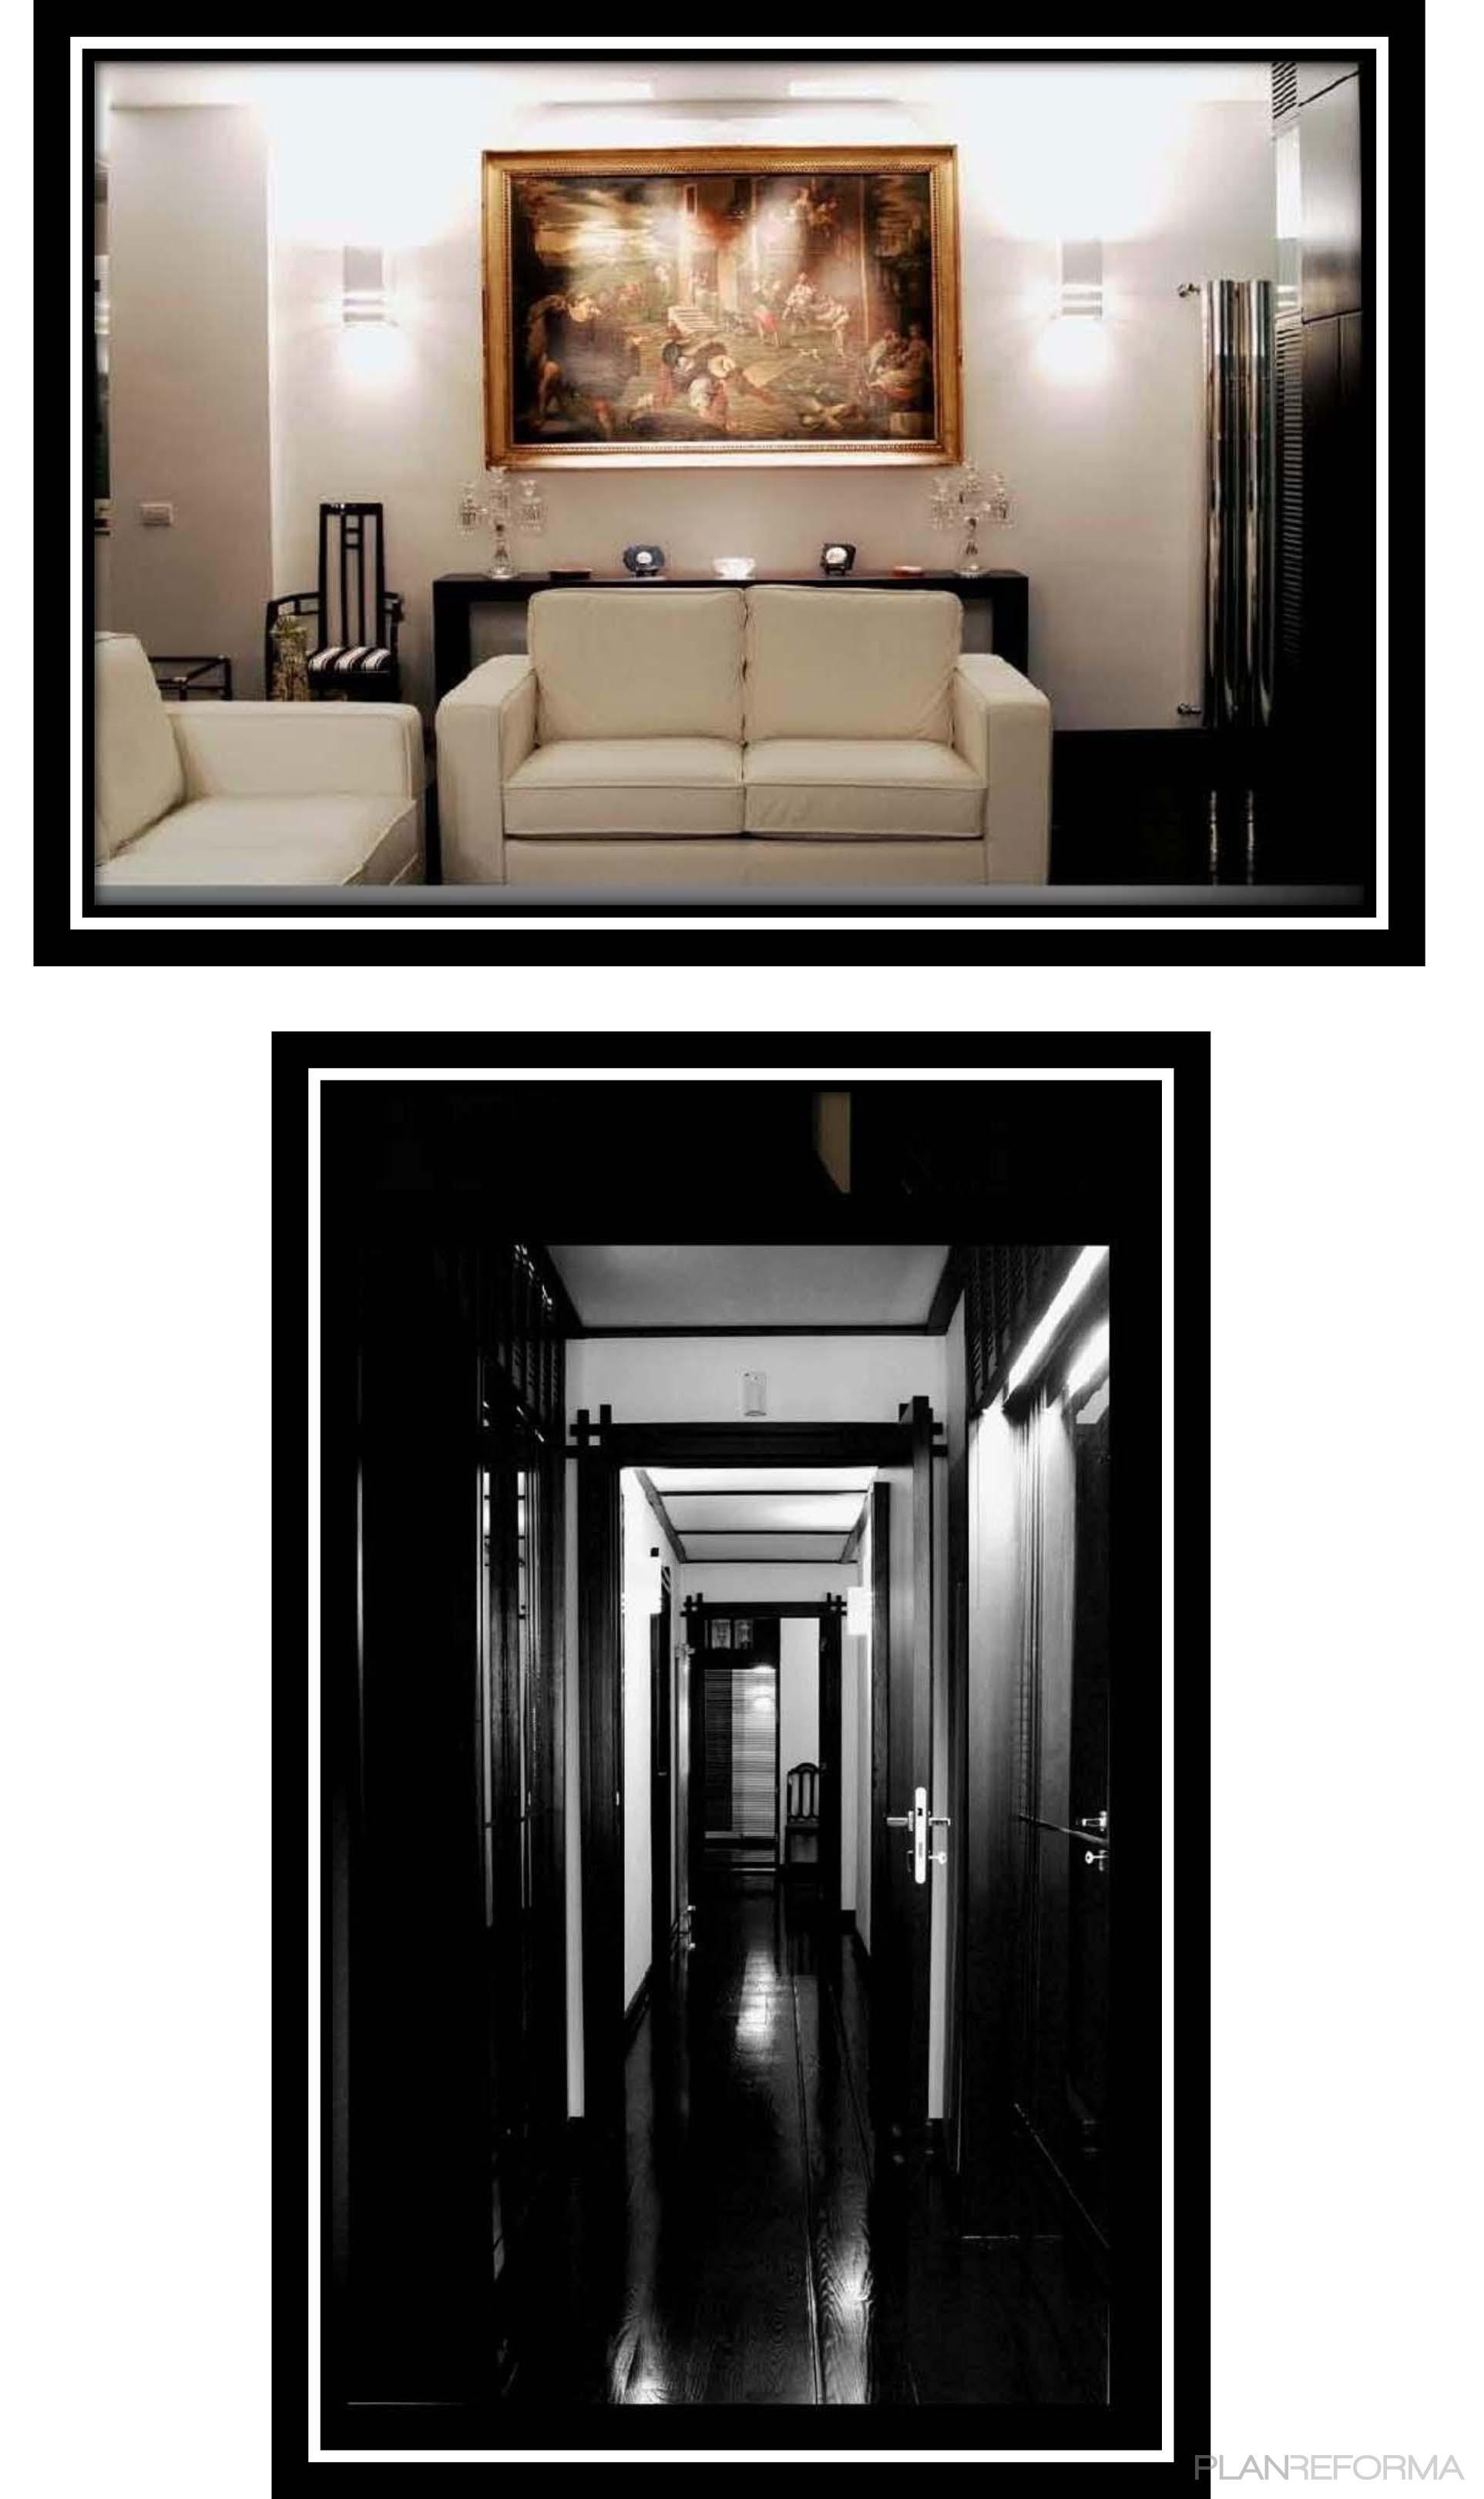 Recibidor salon estilo moderno color beige blanco negro - Recibidor moderno blanco ...